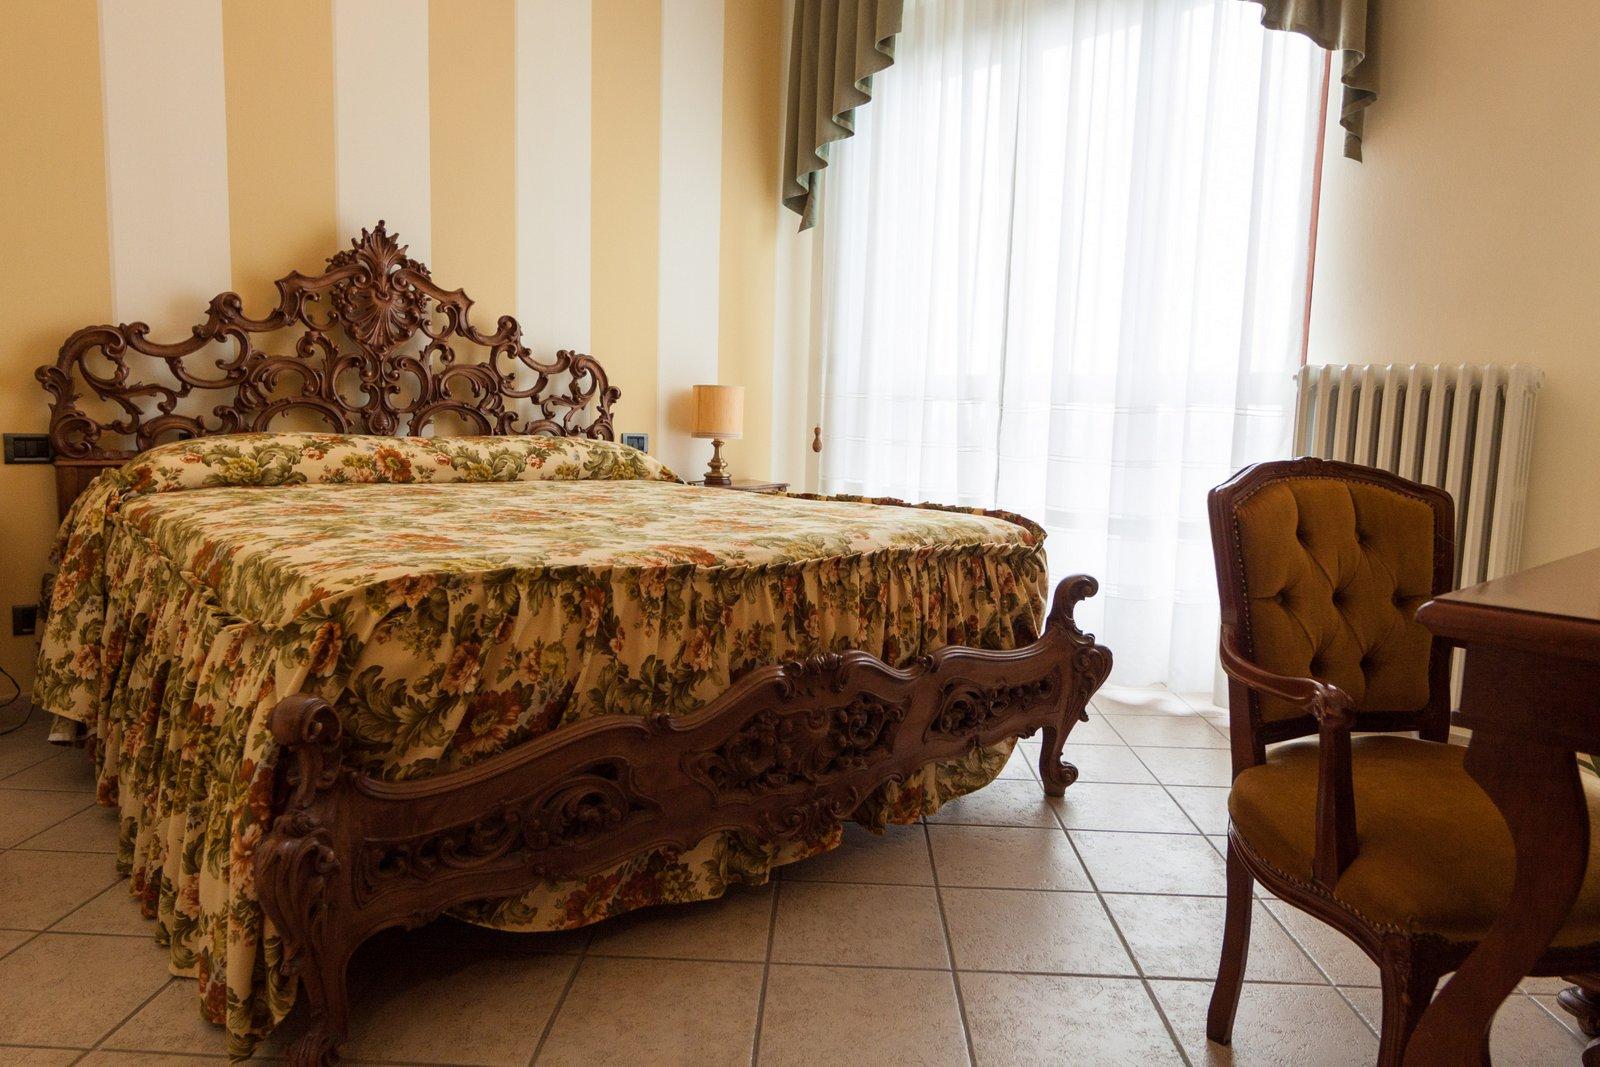 Le camere dell'hotel Belvedere